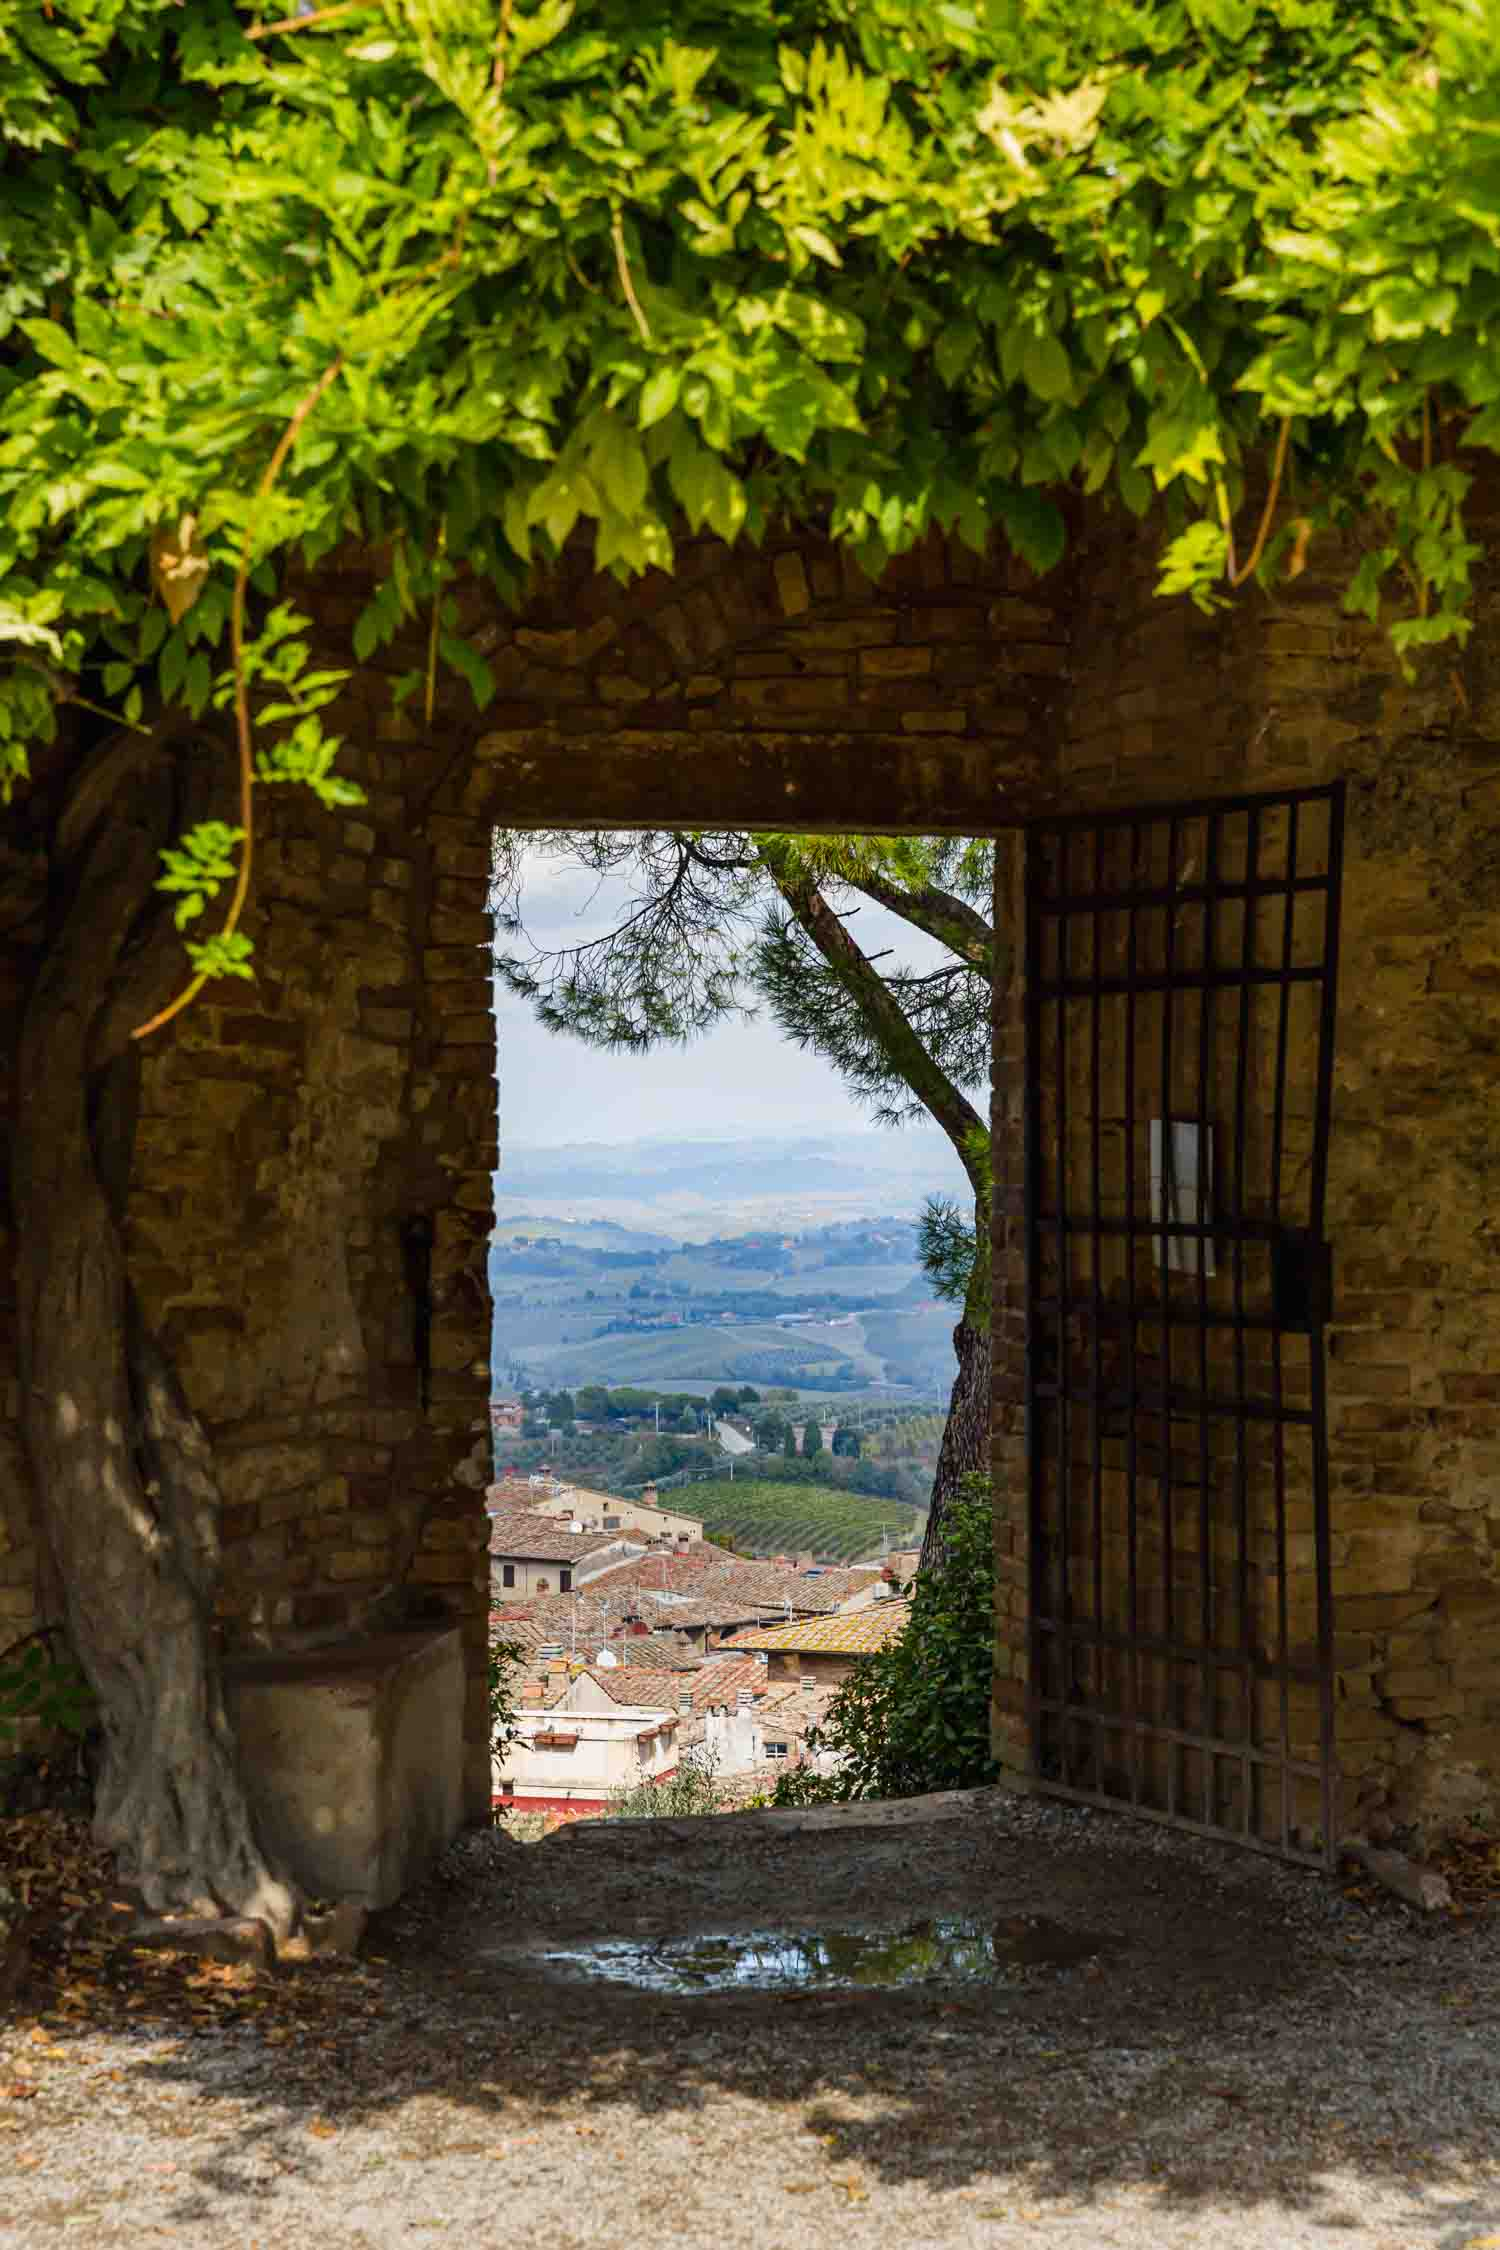 Incredible views in San Gimignano, Italy. #tuscany #travel #italy #italianfarmhouse #olivegroves #travelphotography #vineyards #italyinautumn #beautifulitaly #vegantravel #italytravel #veganitaly #vegantuscany #veganhotel #ecotourism #organichotel #veganhotel #veganretreat #veganbedandbreakfast #sangimignano